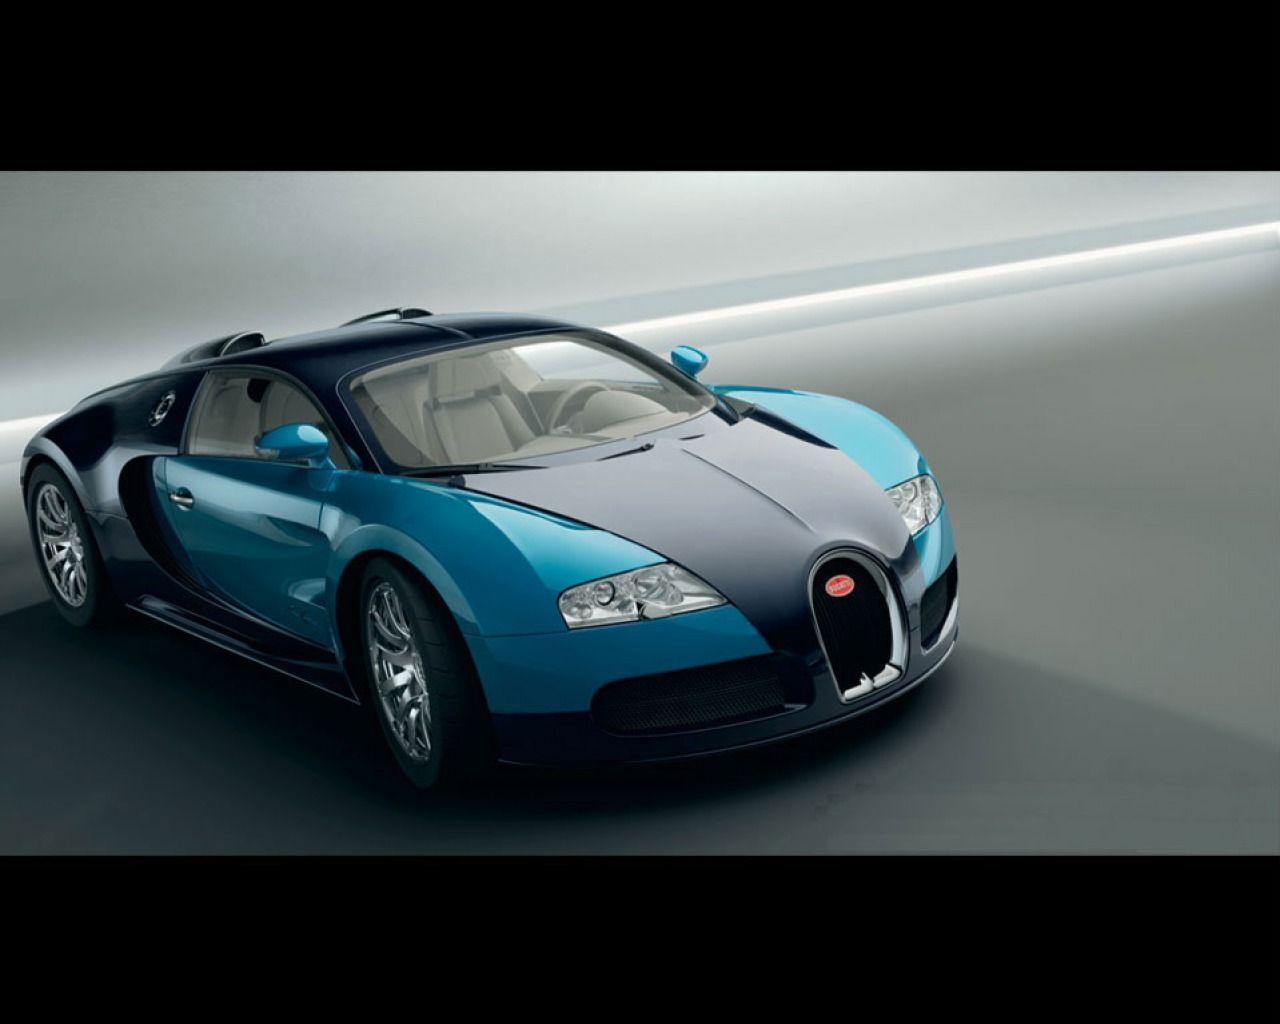 Bugatti V 16 Bugatti Veyron Bugatti Bugatti Cars